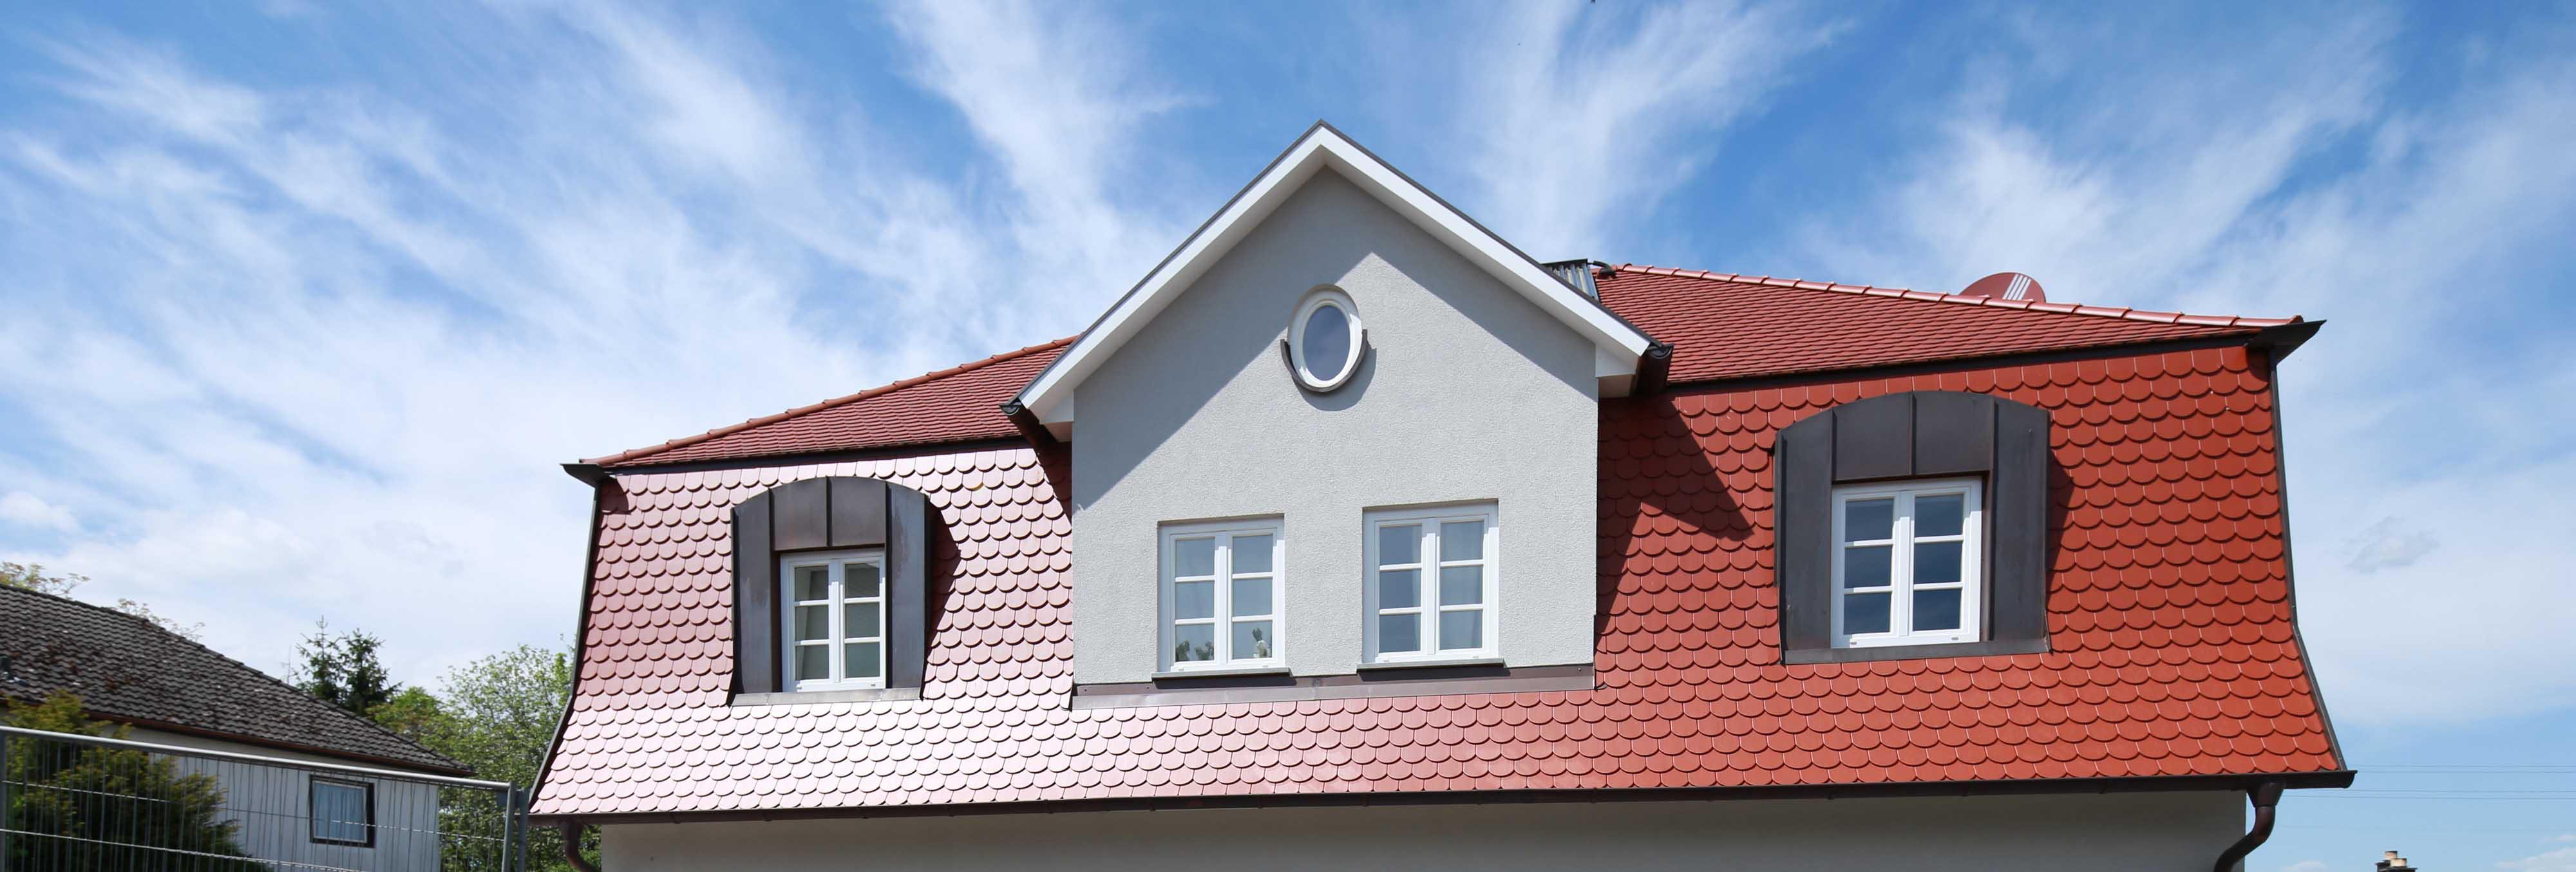 renovierung-dach-holzausbau-karlburger-holzbau